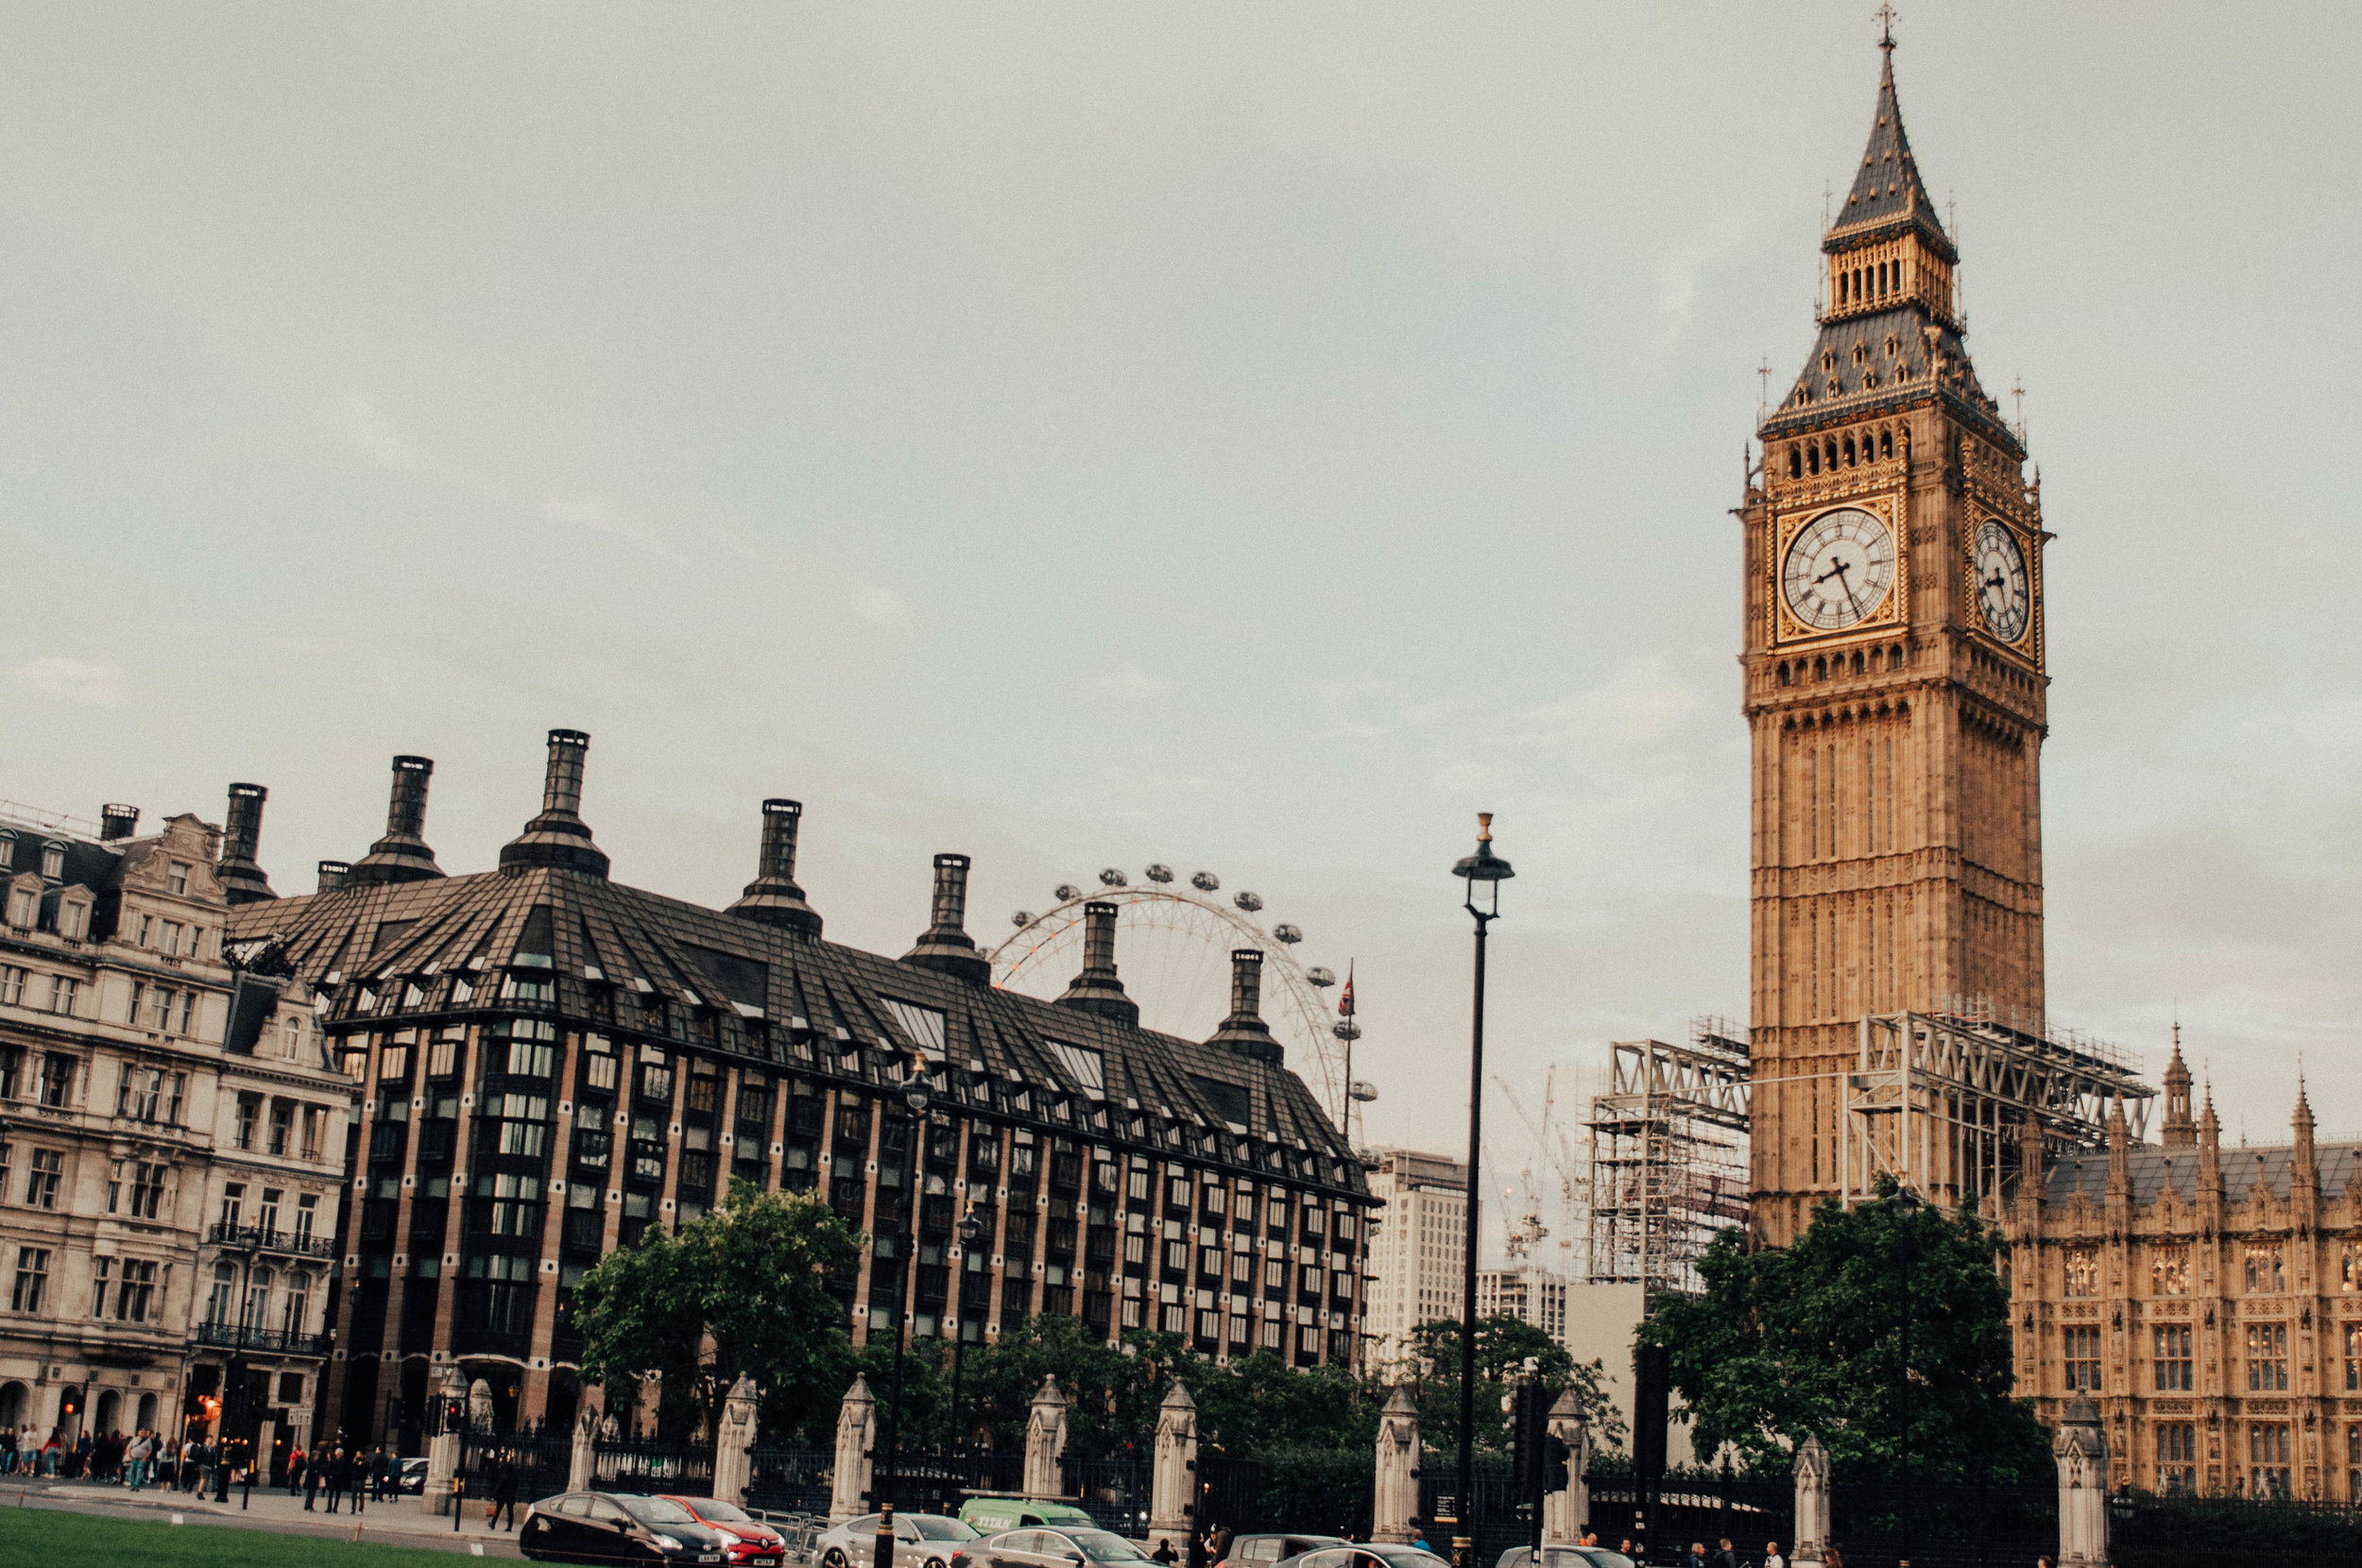 Big Ben & the London Eye